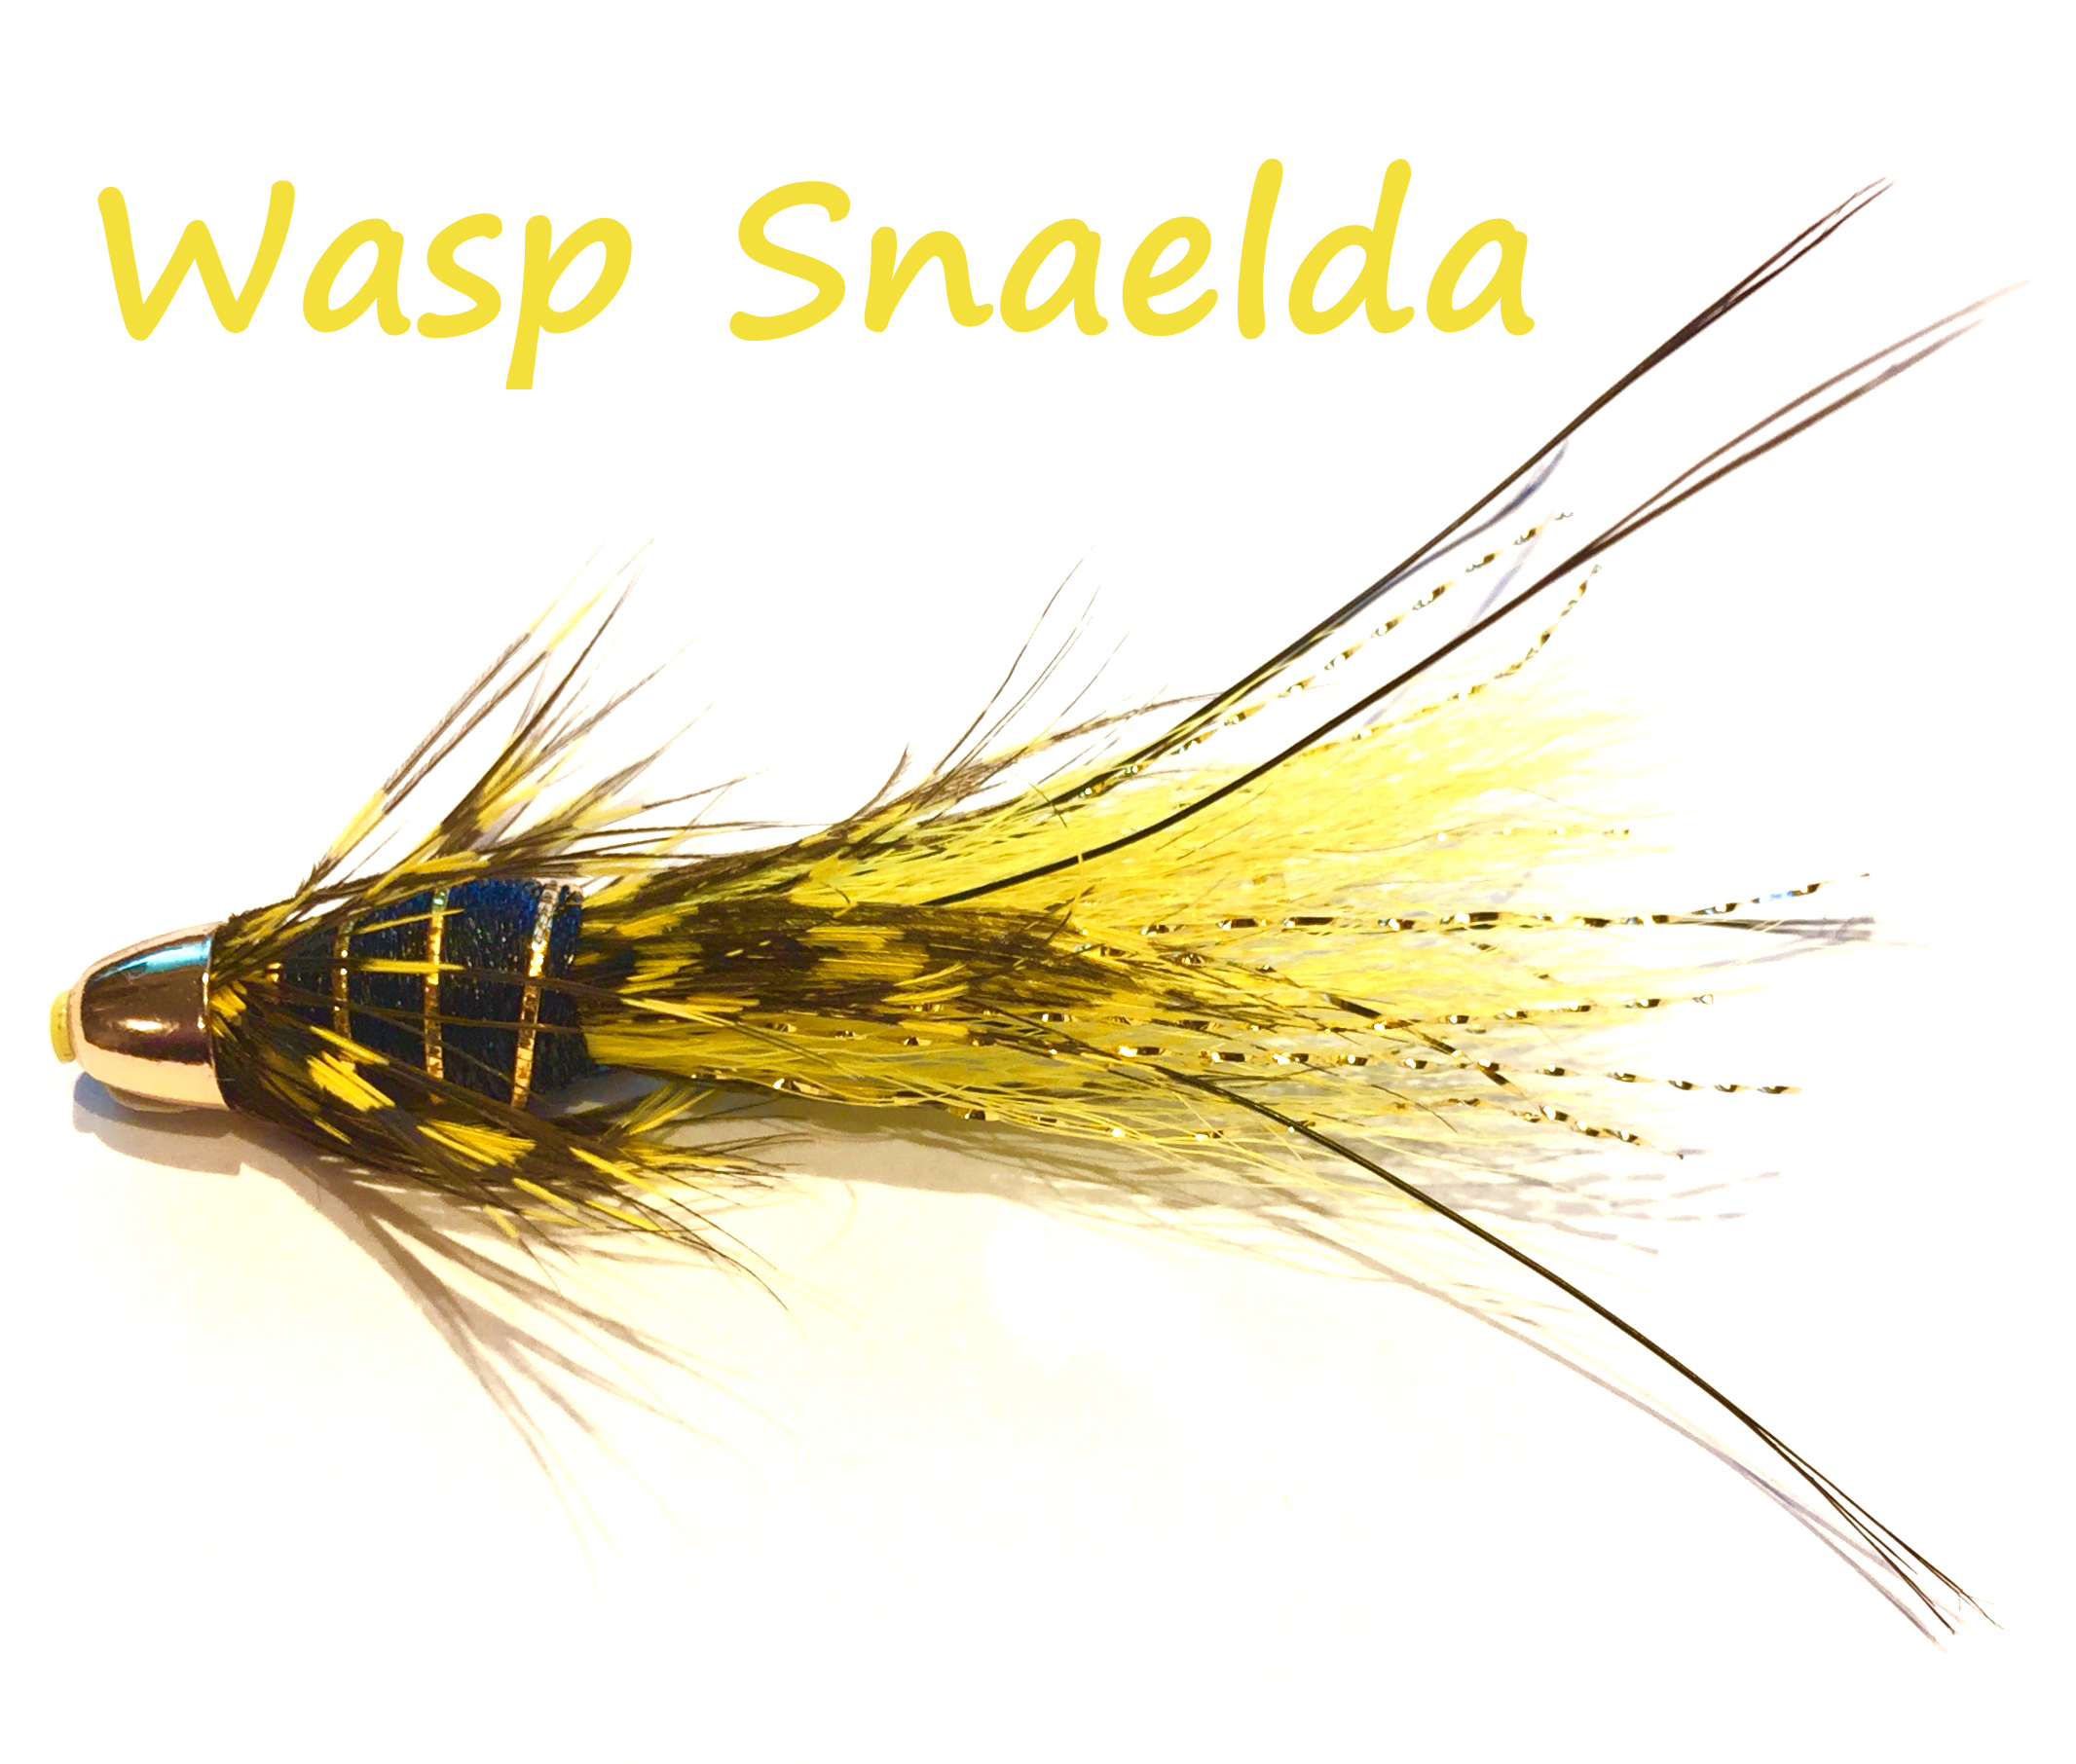 Wasp Snaelda FDG.jpg